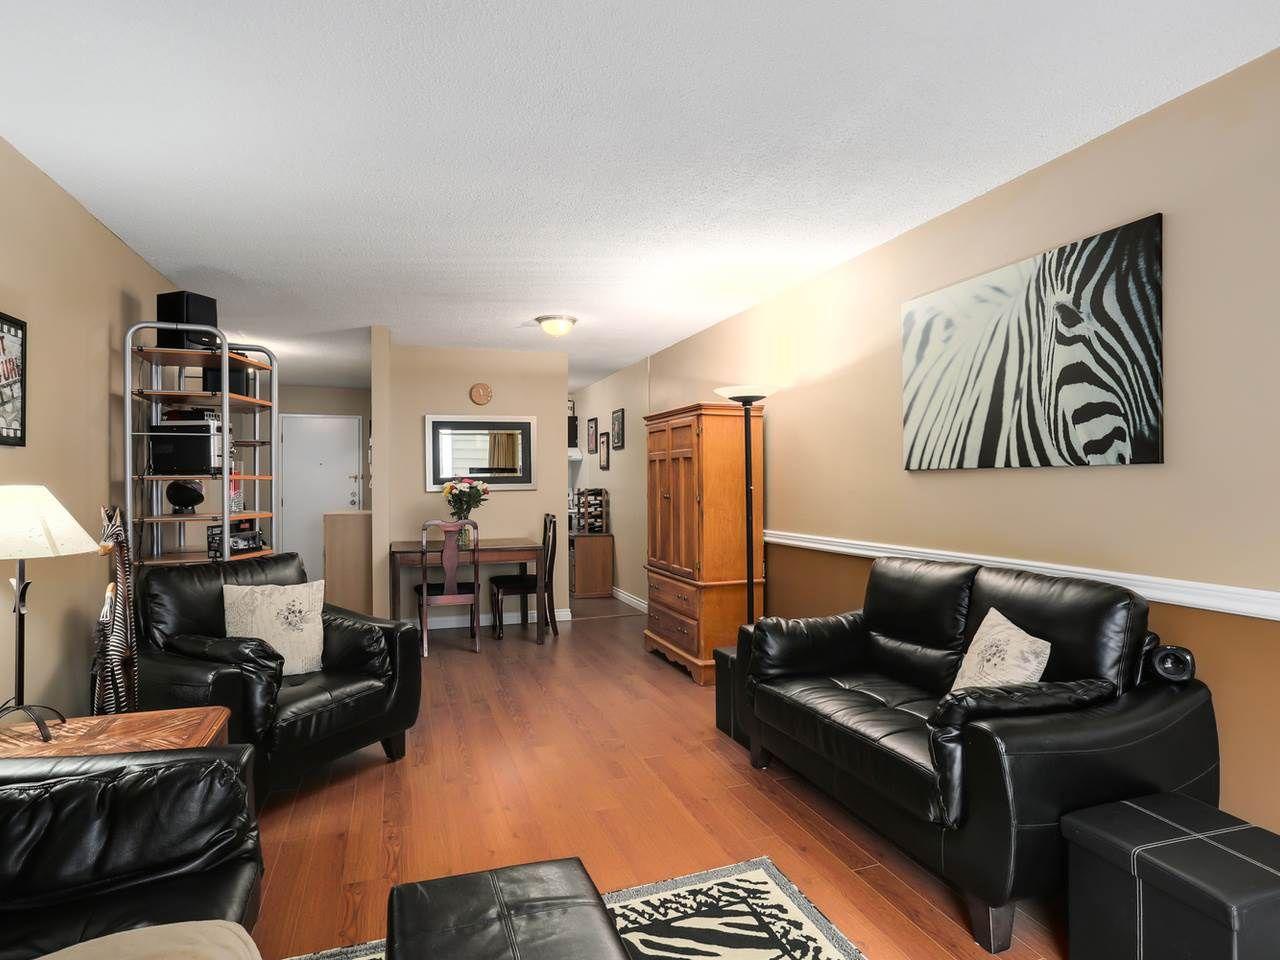 "Photo 1: Photos: 278C 8635 120 Street in Delta: Annieville Condo for sale in ""Delta Cedars"" (N. Delta)  : MLS®# R2037207"